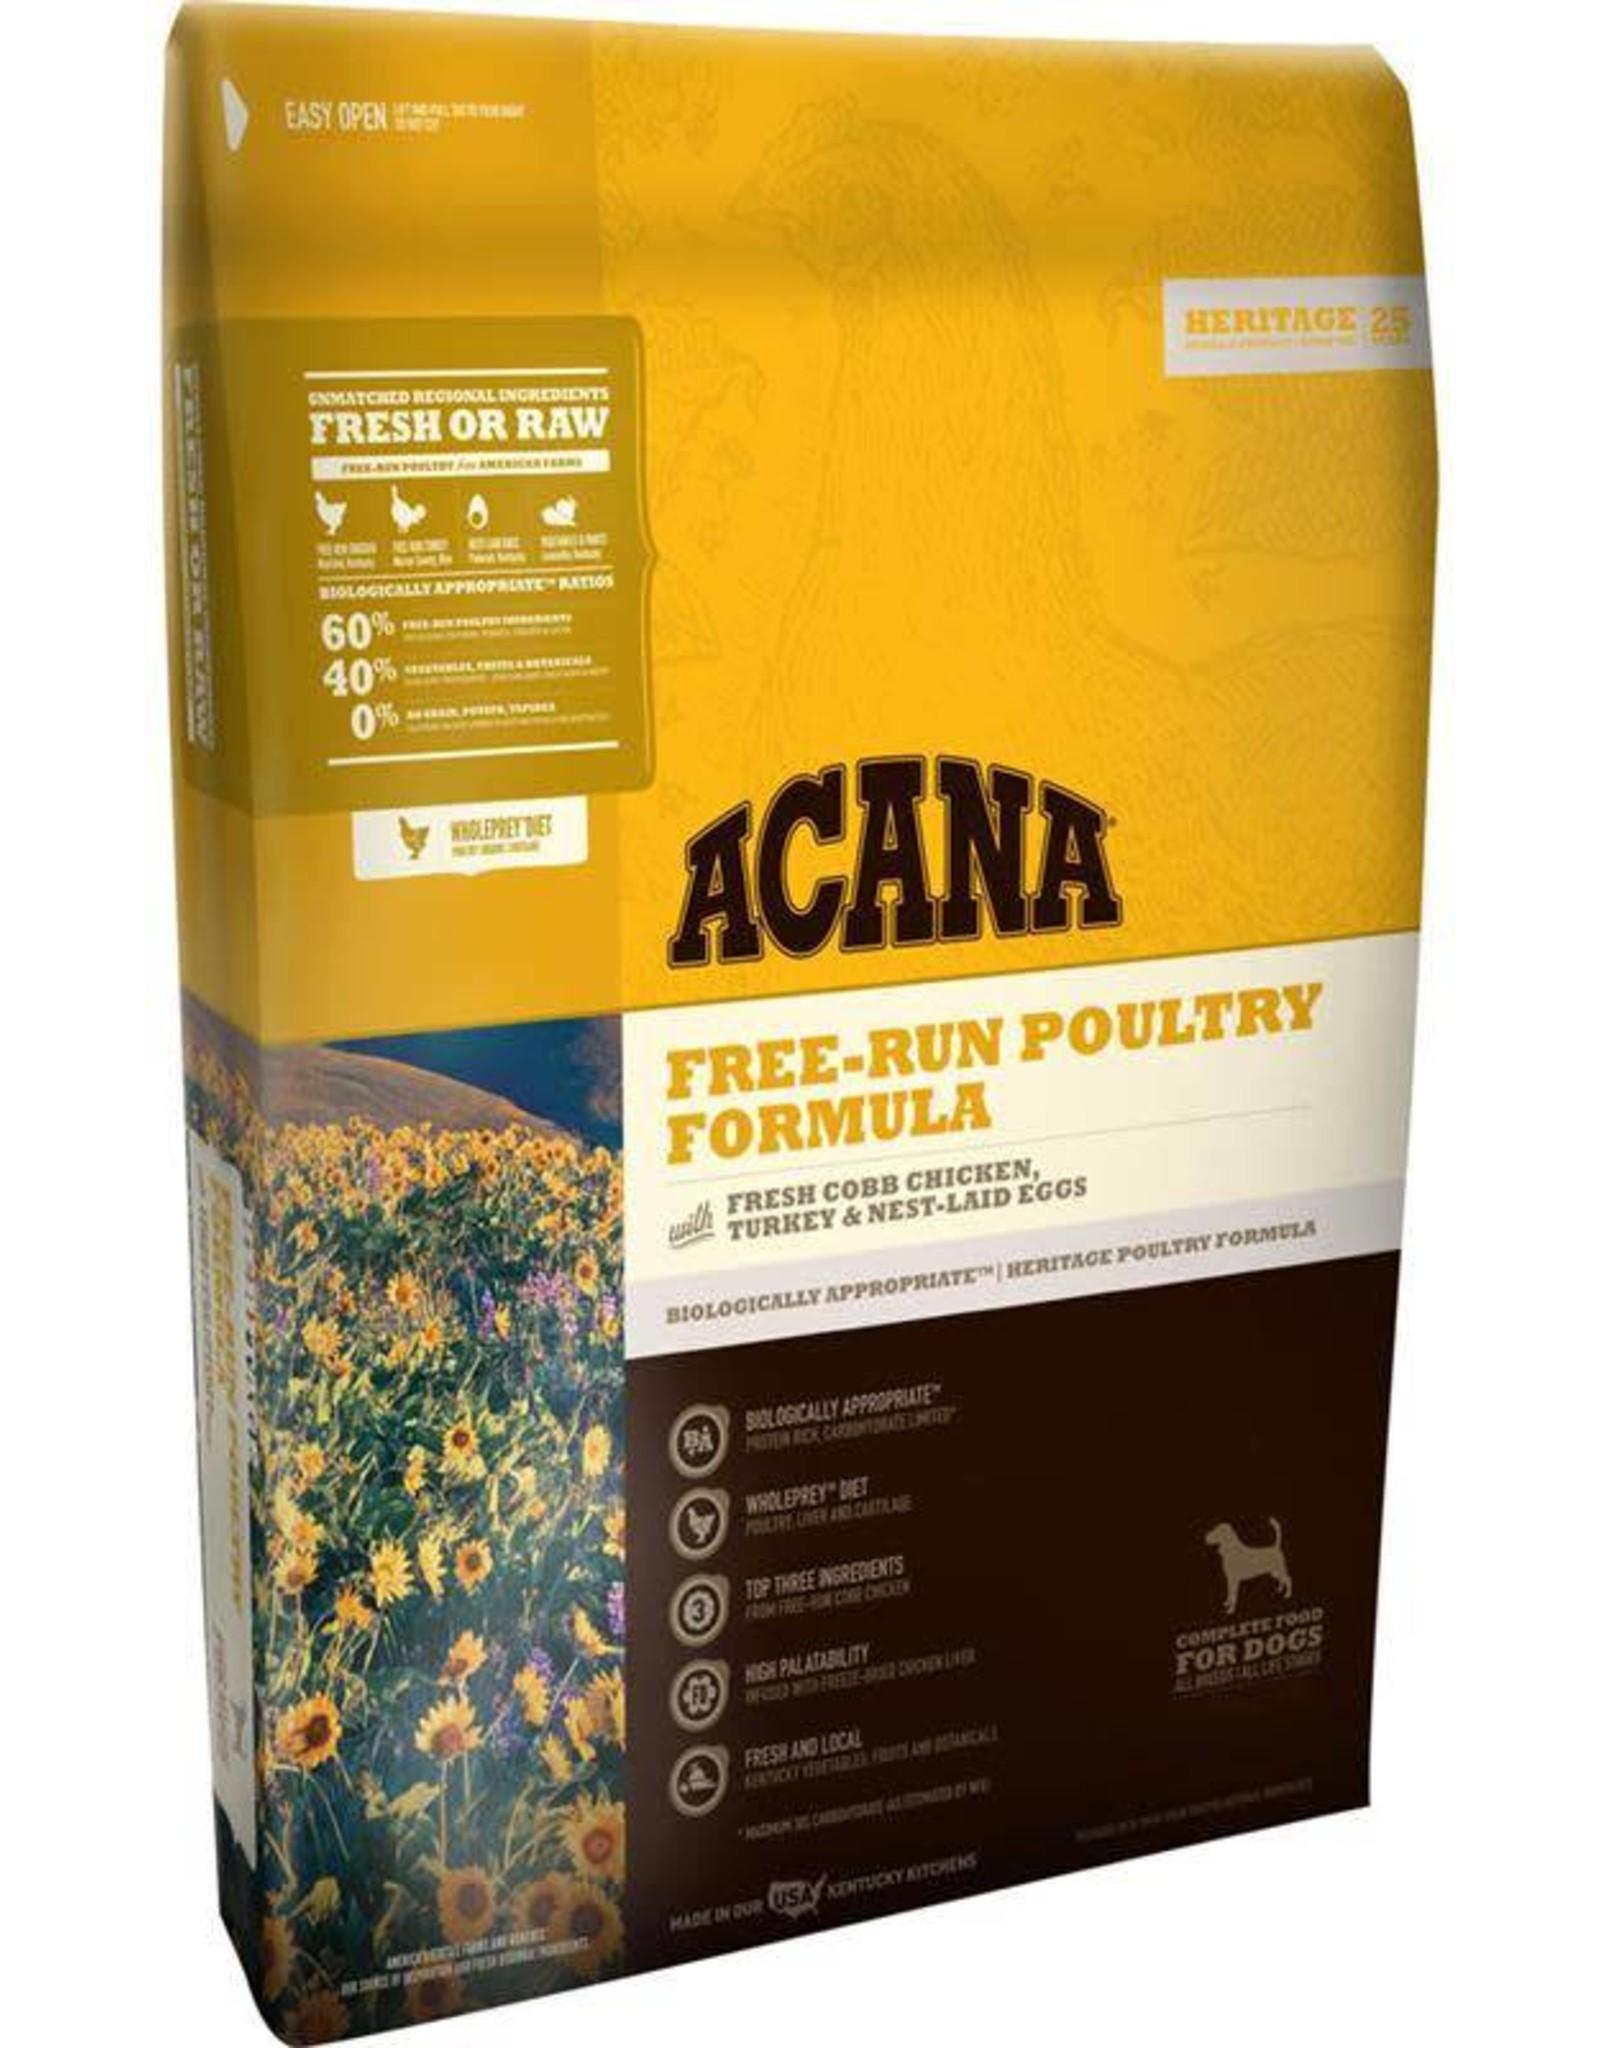 Acana Acana Heritage Grain-Free, Free-Run Poultry/ Fresh Cobb Chicken, Turkey & Nest-Laid Eggs Dry Dog Food